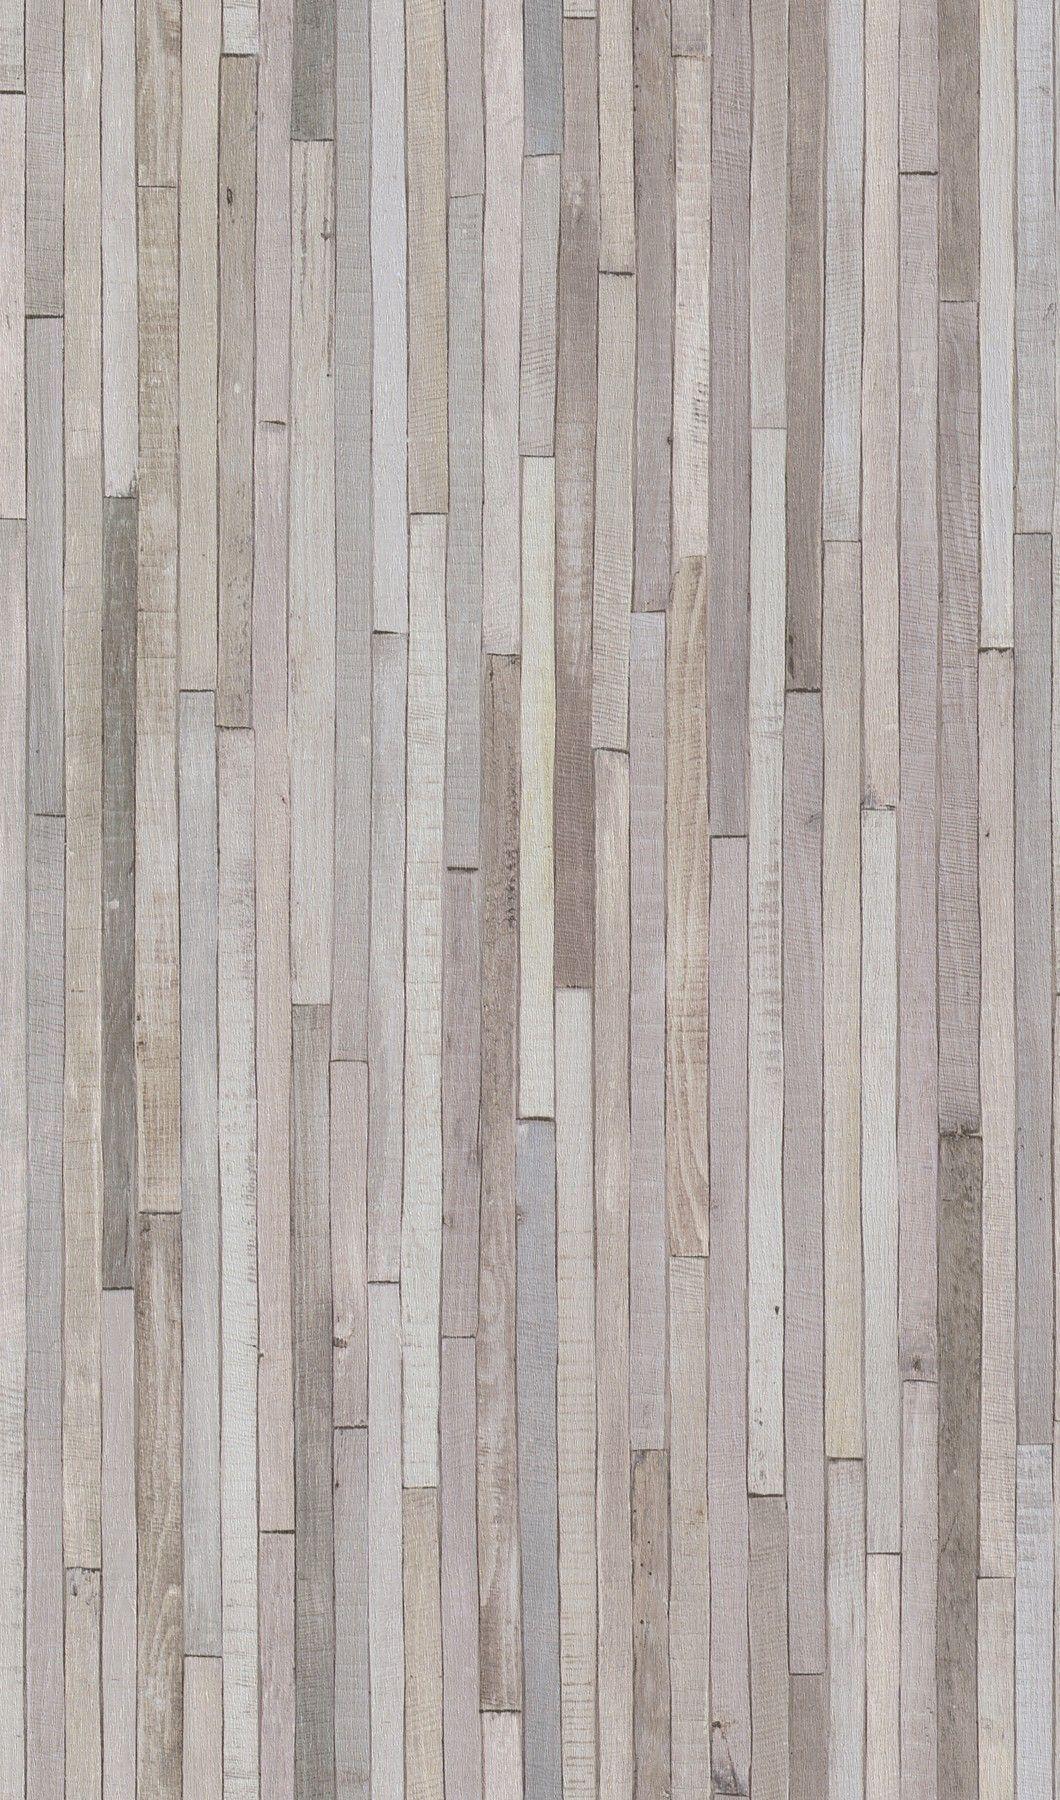 Papel pintado imitaci n madera ideal para hacer de tus - Papel pintado imitacion madera ...